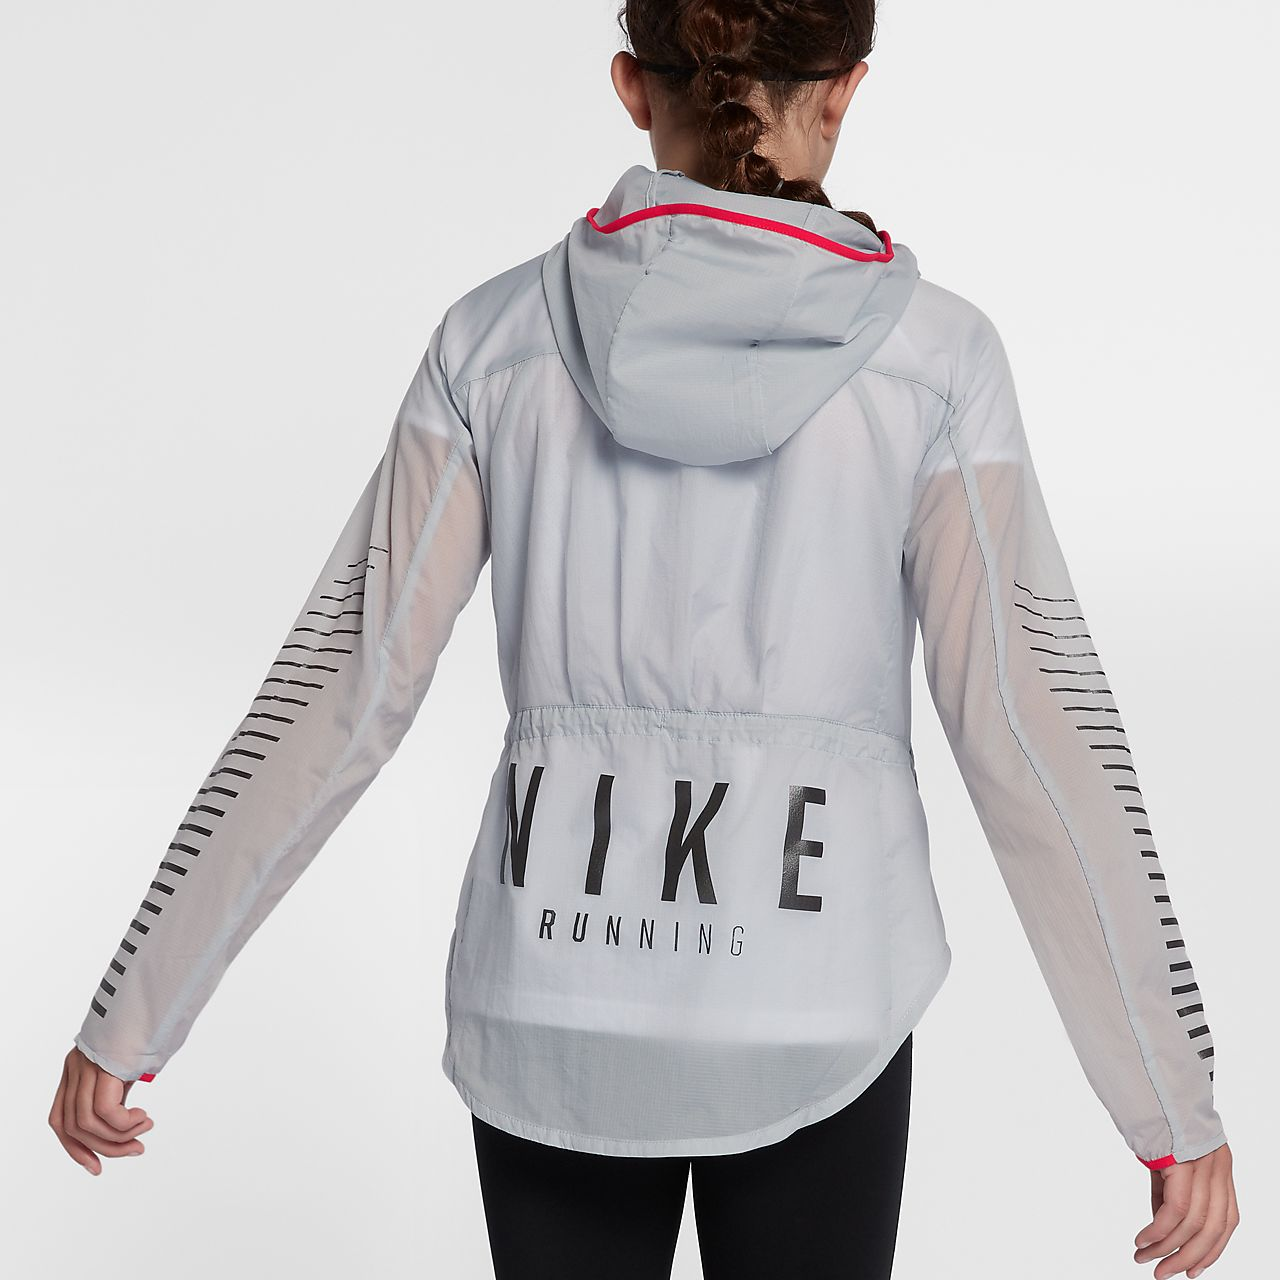 8xwqytt 8xwqytt Veste 8xwqytt Veste Light Impossibly Veste Impossibly Nike Nike Light Nike Light Impossibly Impossibly dqpxwtdf